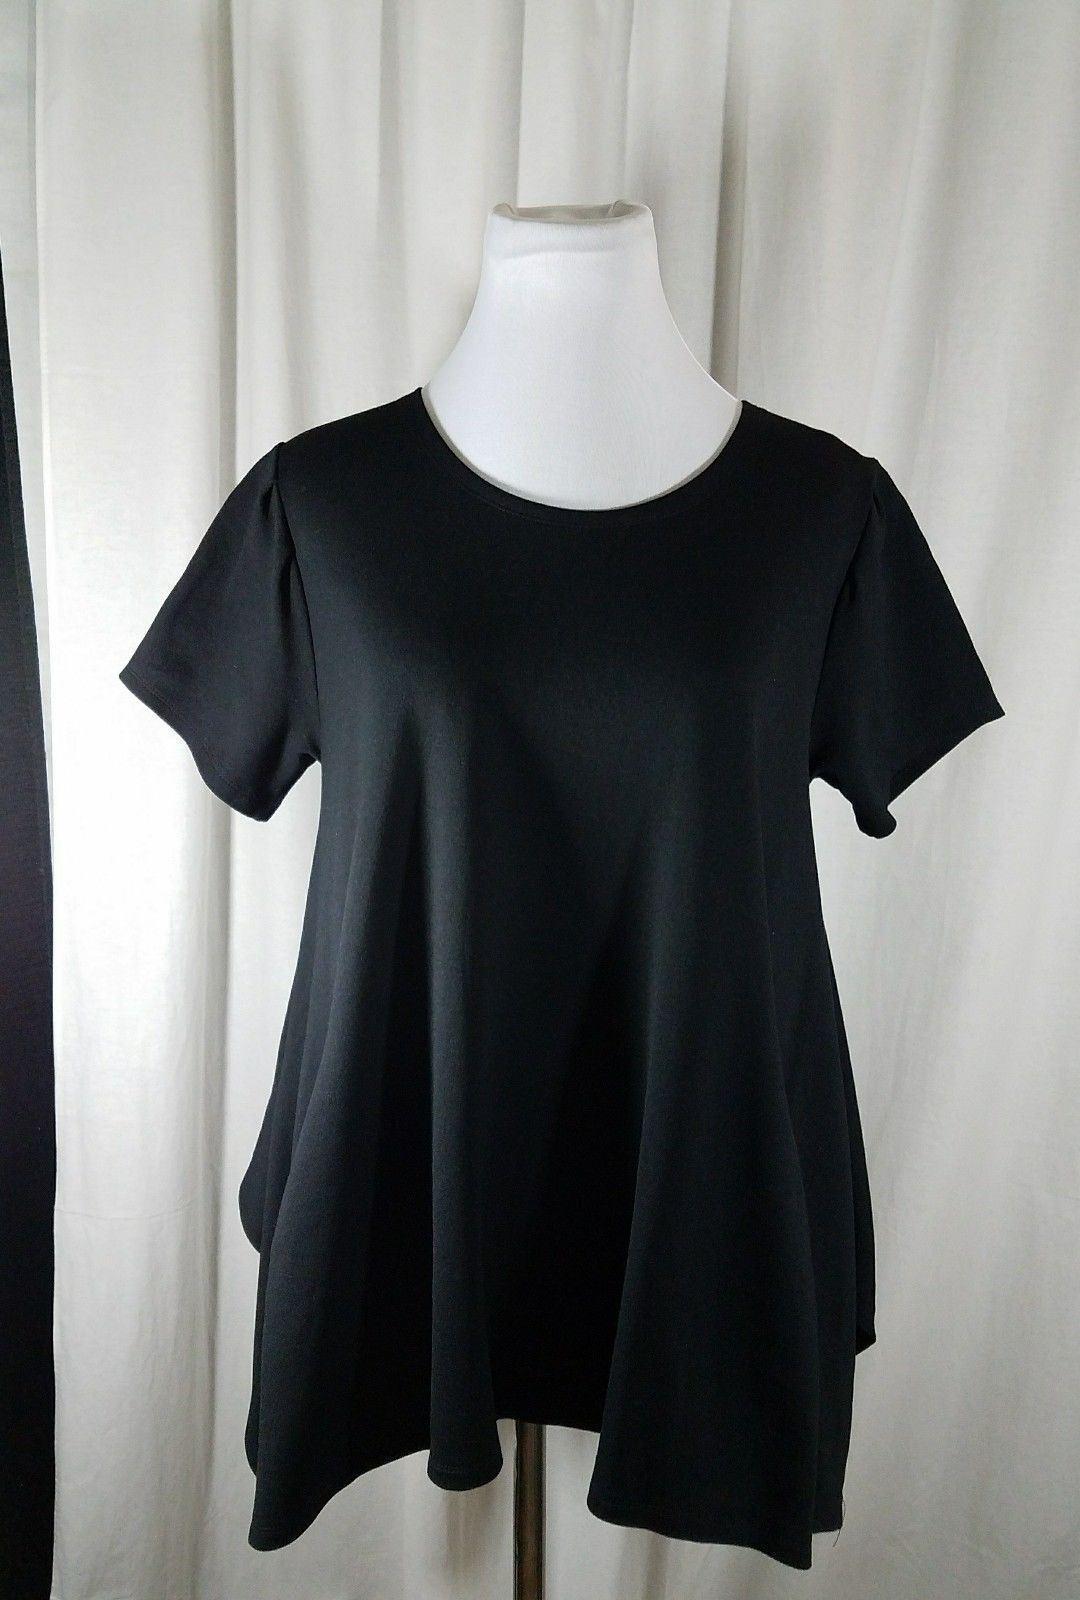 Pazzo Black Top Asymmetrical Hemline Round Neckline Short Sleeve Size L